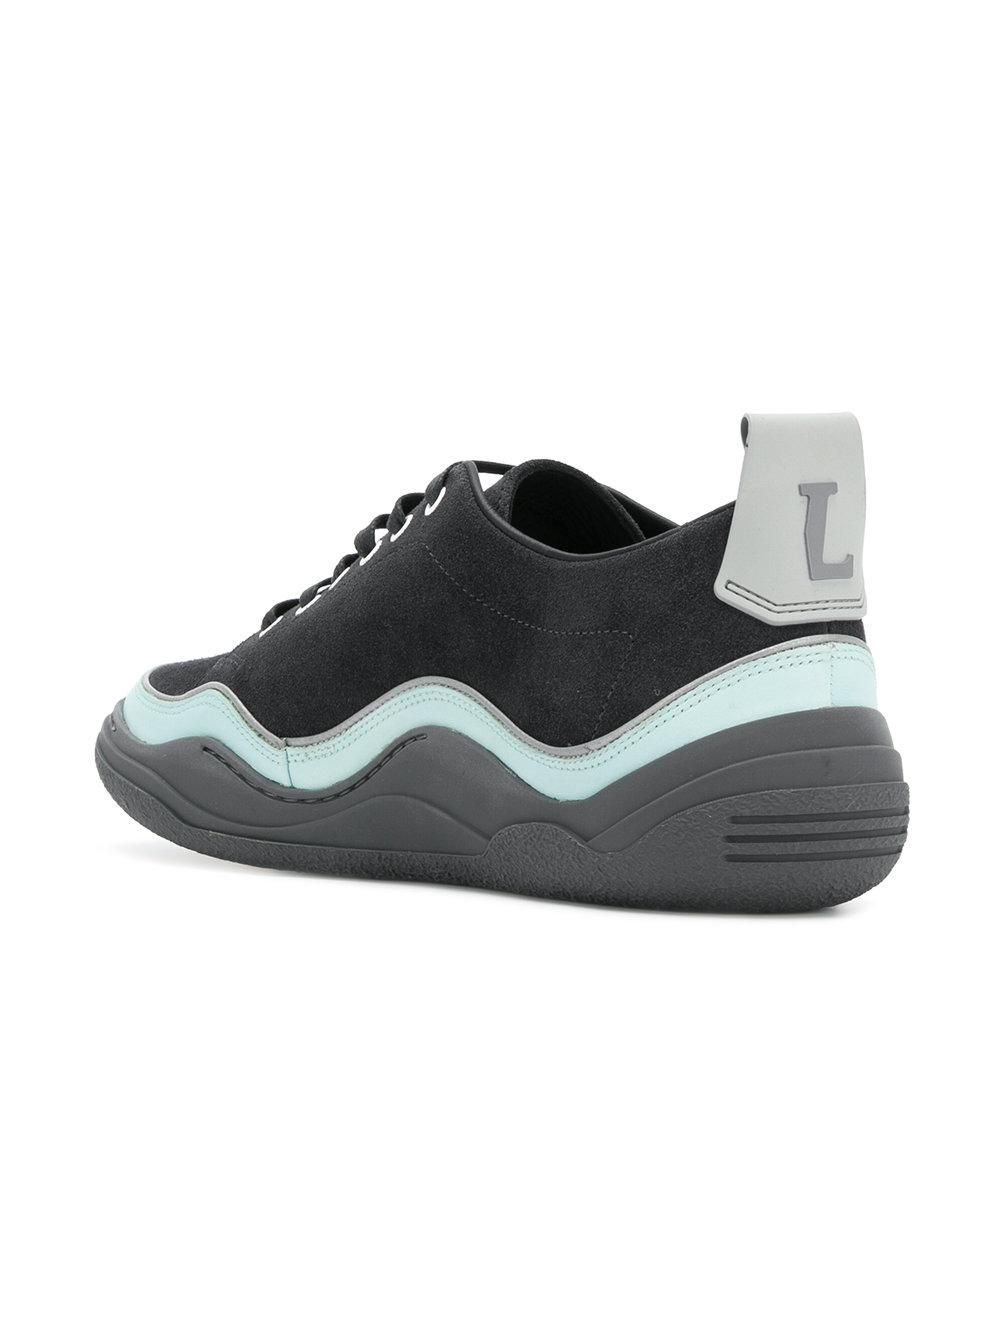 textured runner sneakers - Blue Lanvin CZmXcrB